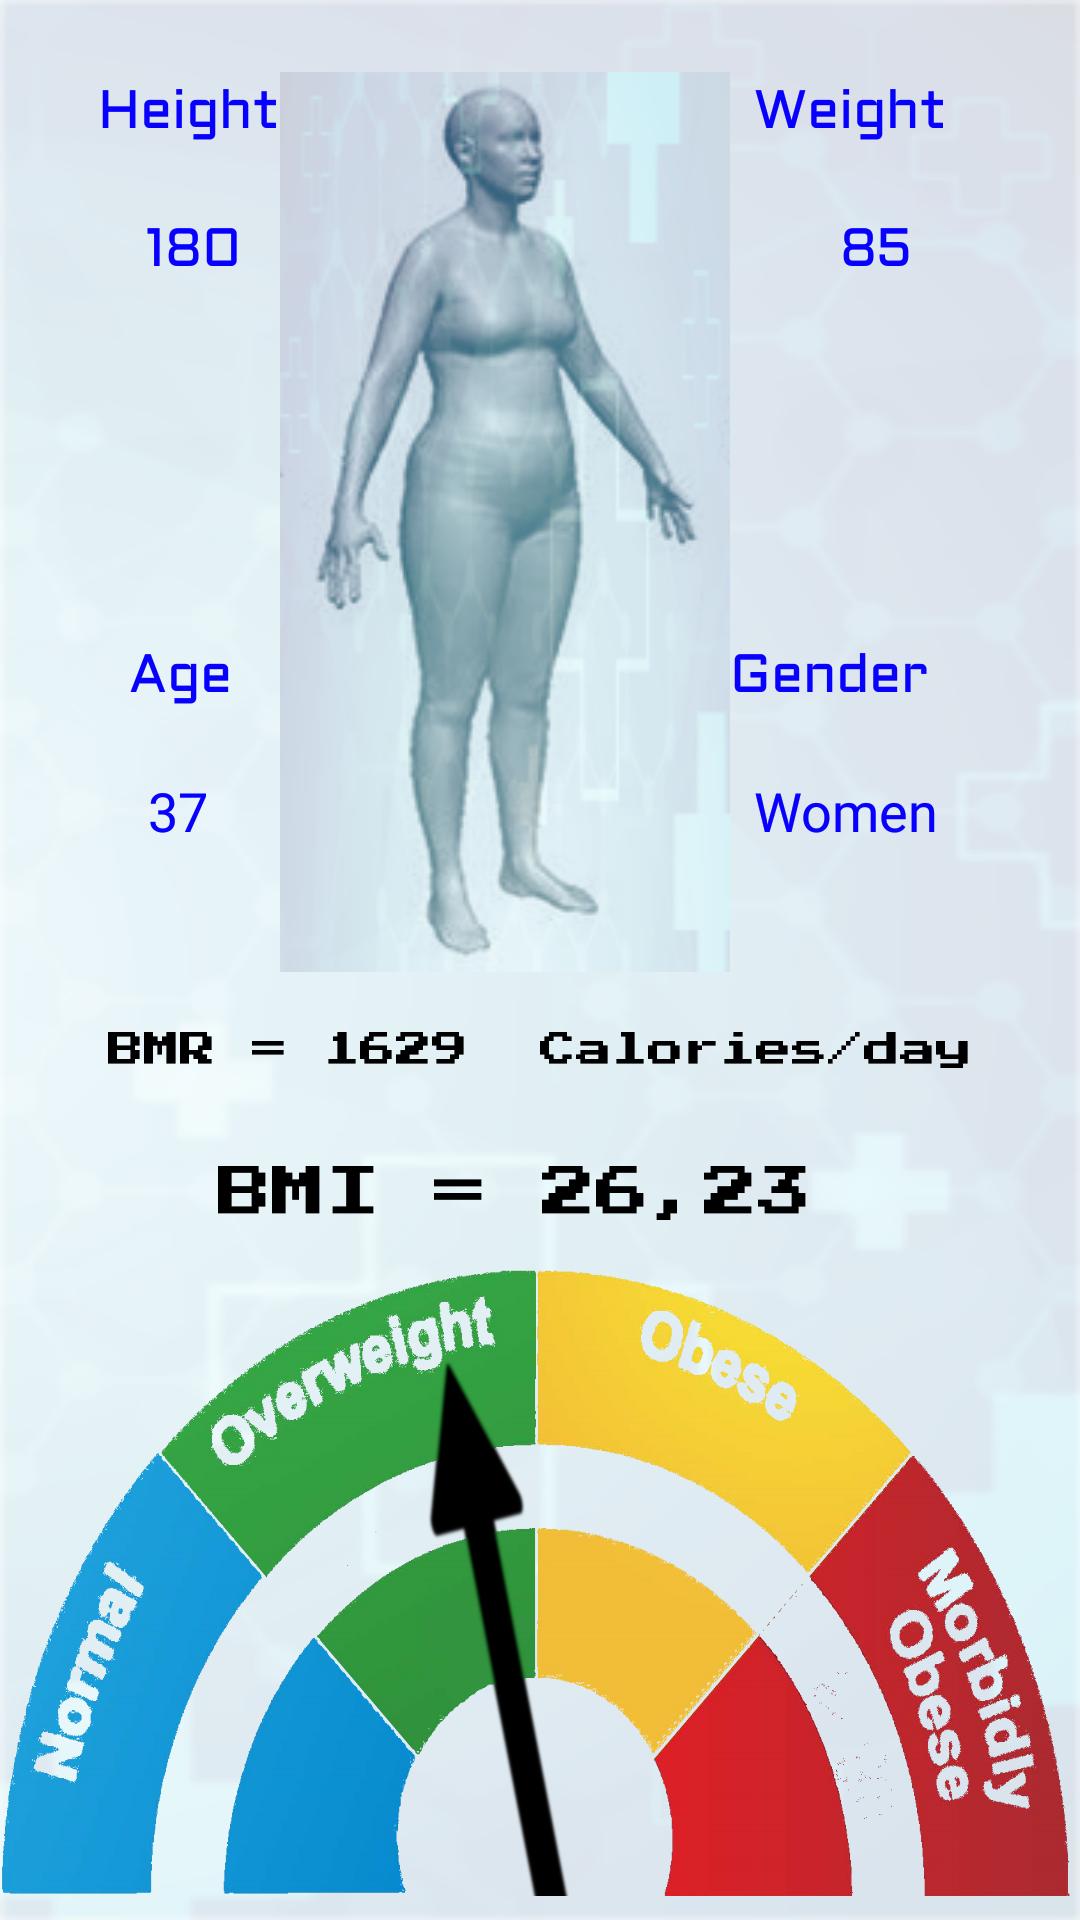 Bmi 26